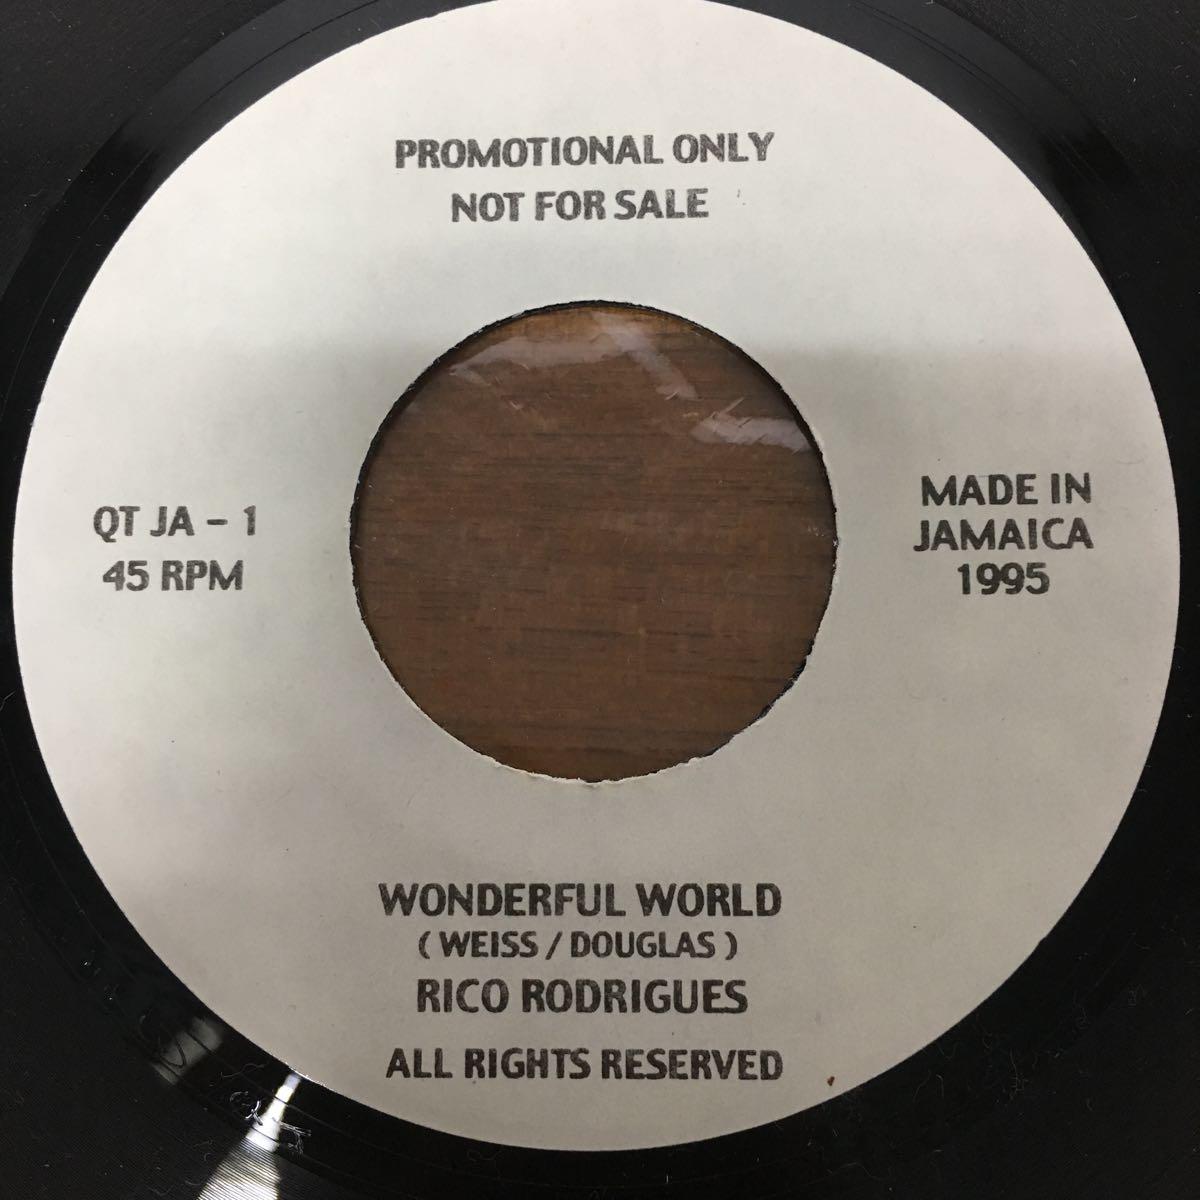 WONDERFUL WORLD / RICO RODRIGUES 7インチレコード 非売品? レア rocksteady ska カバー